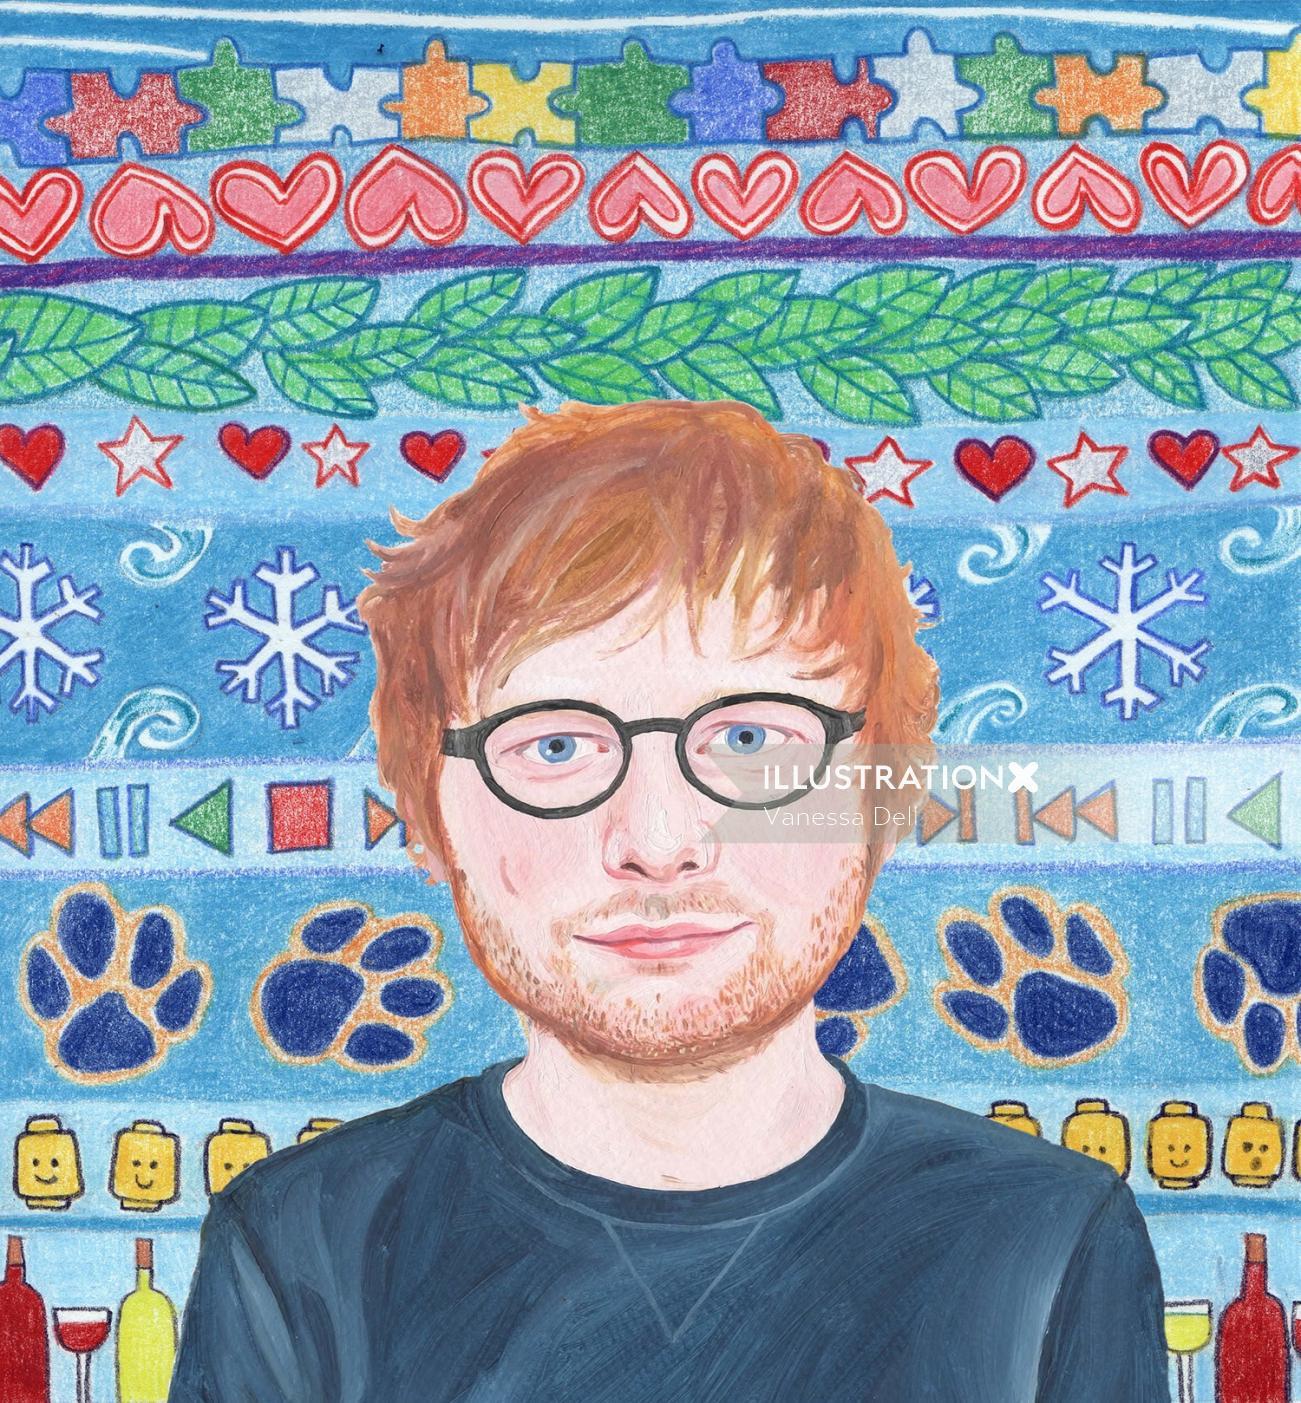 Portrait of Singer/Songwriter Ed Sheeran